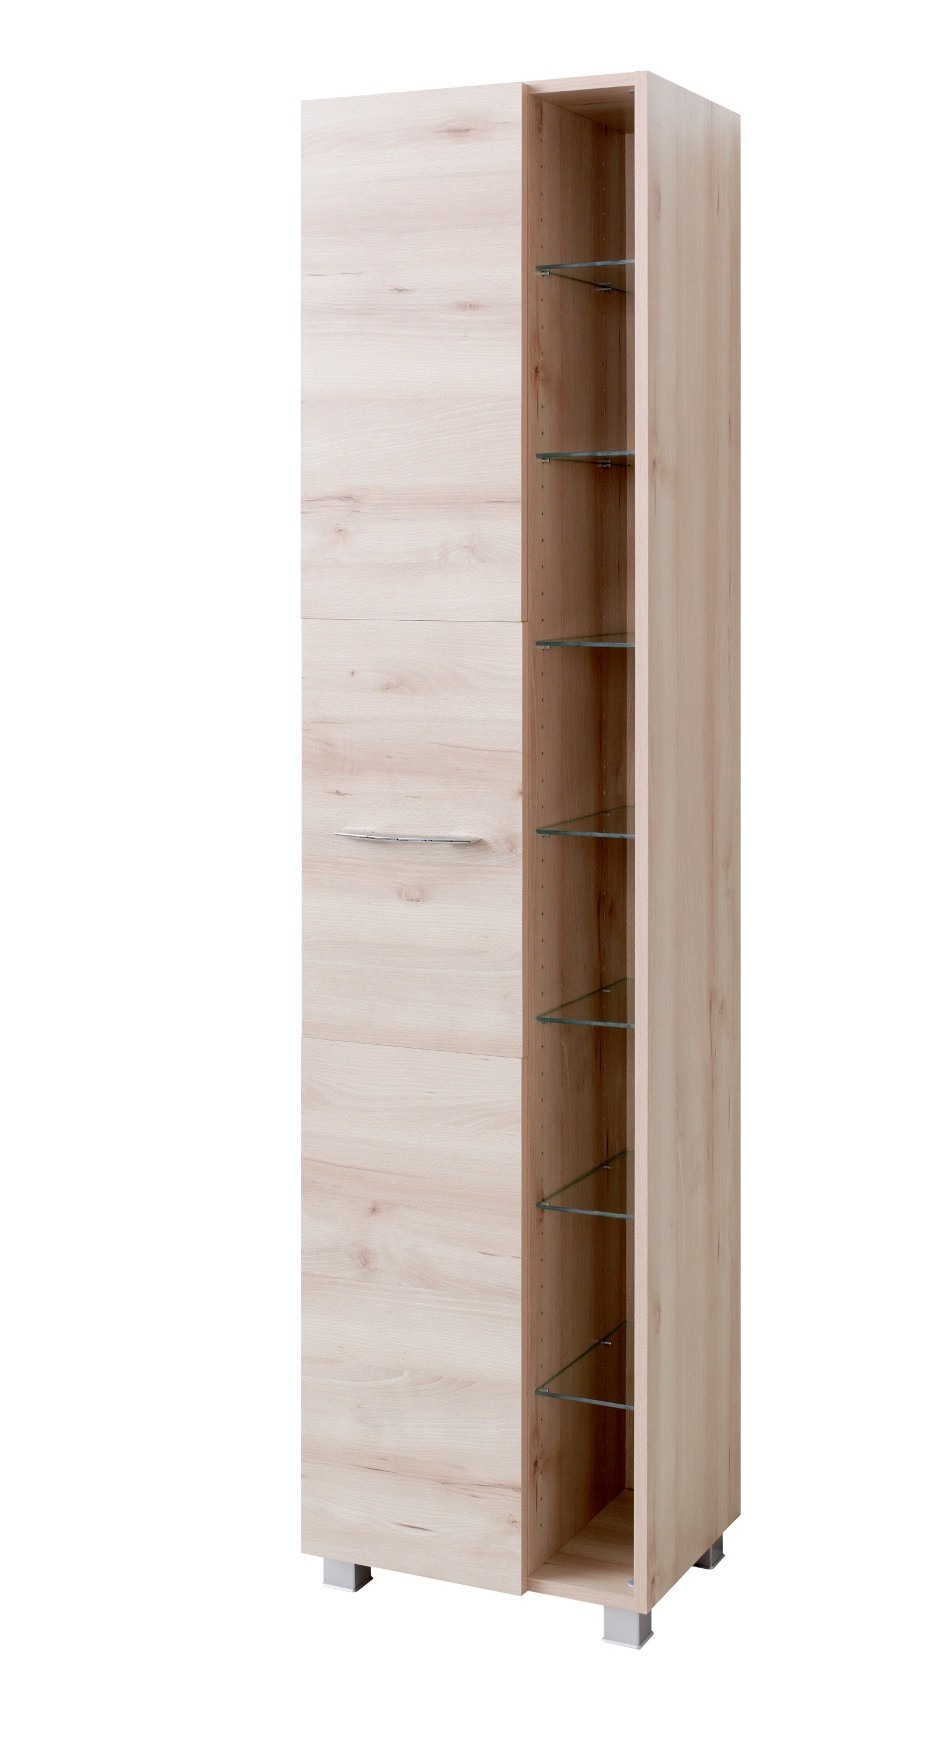 bad hochschrank portofino 1 t rig 7 regalf cher 45 cm breit buche iconic bad bad hochschr nke. Black Bedroom Furniture Sets. Home Design Ideas